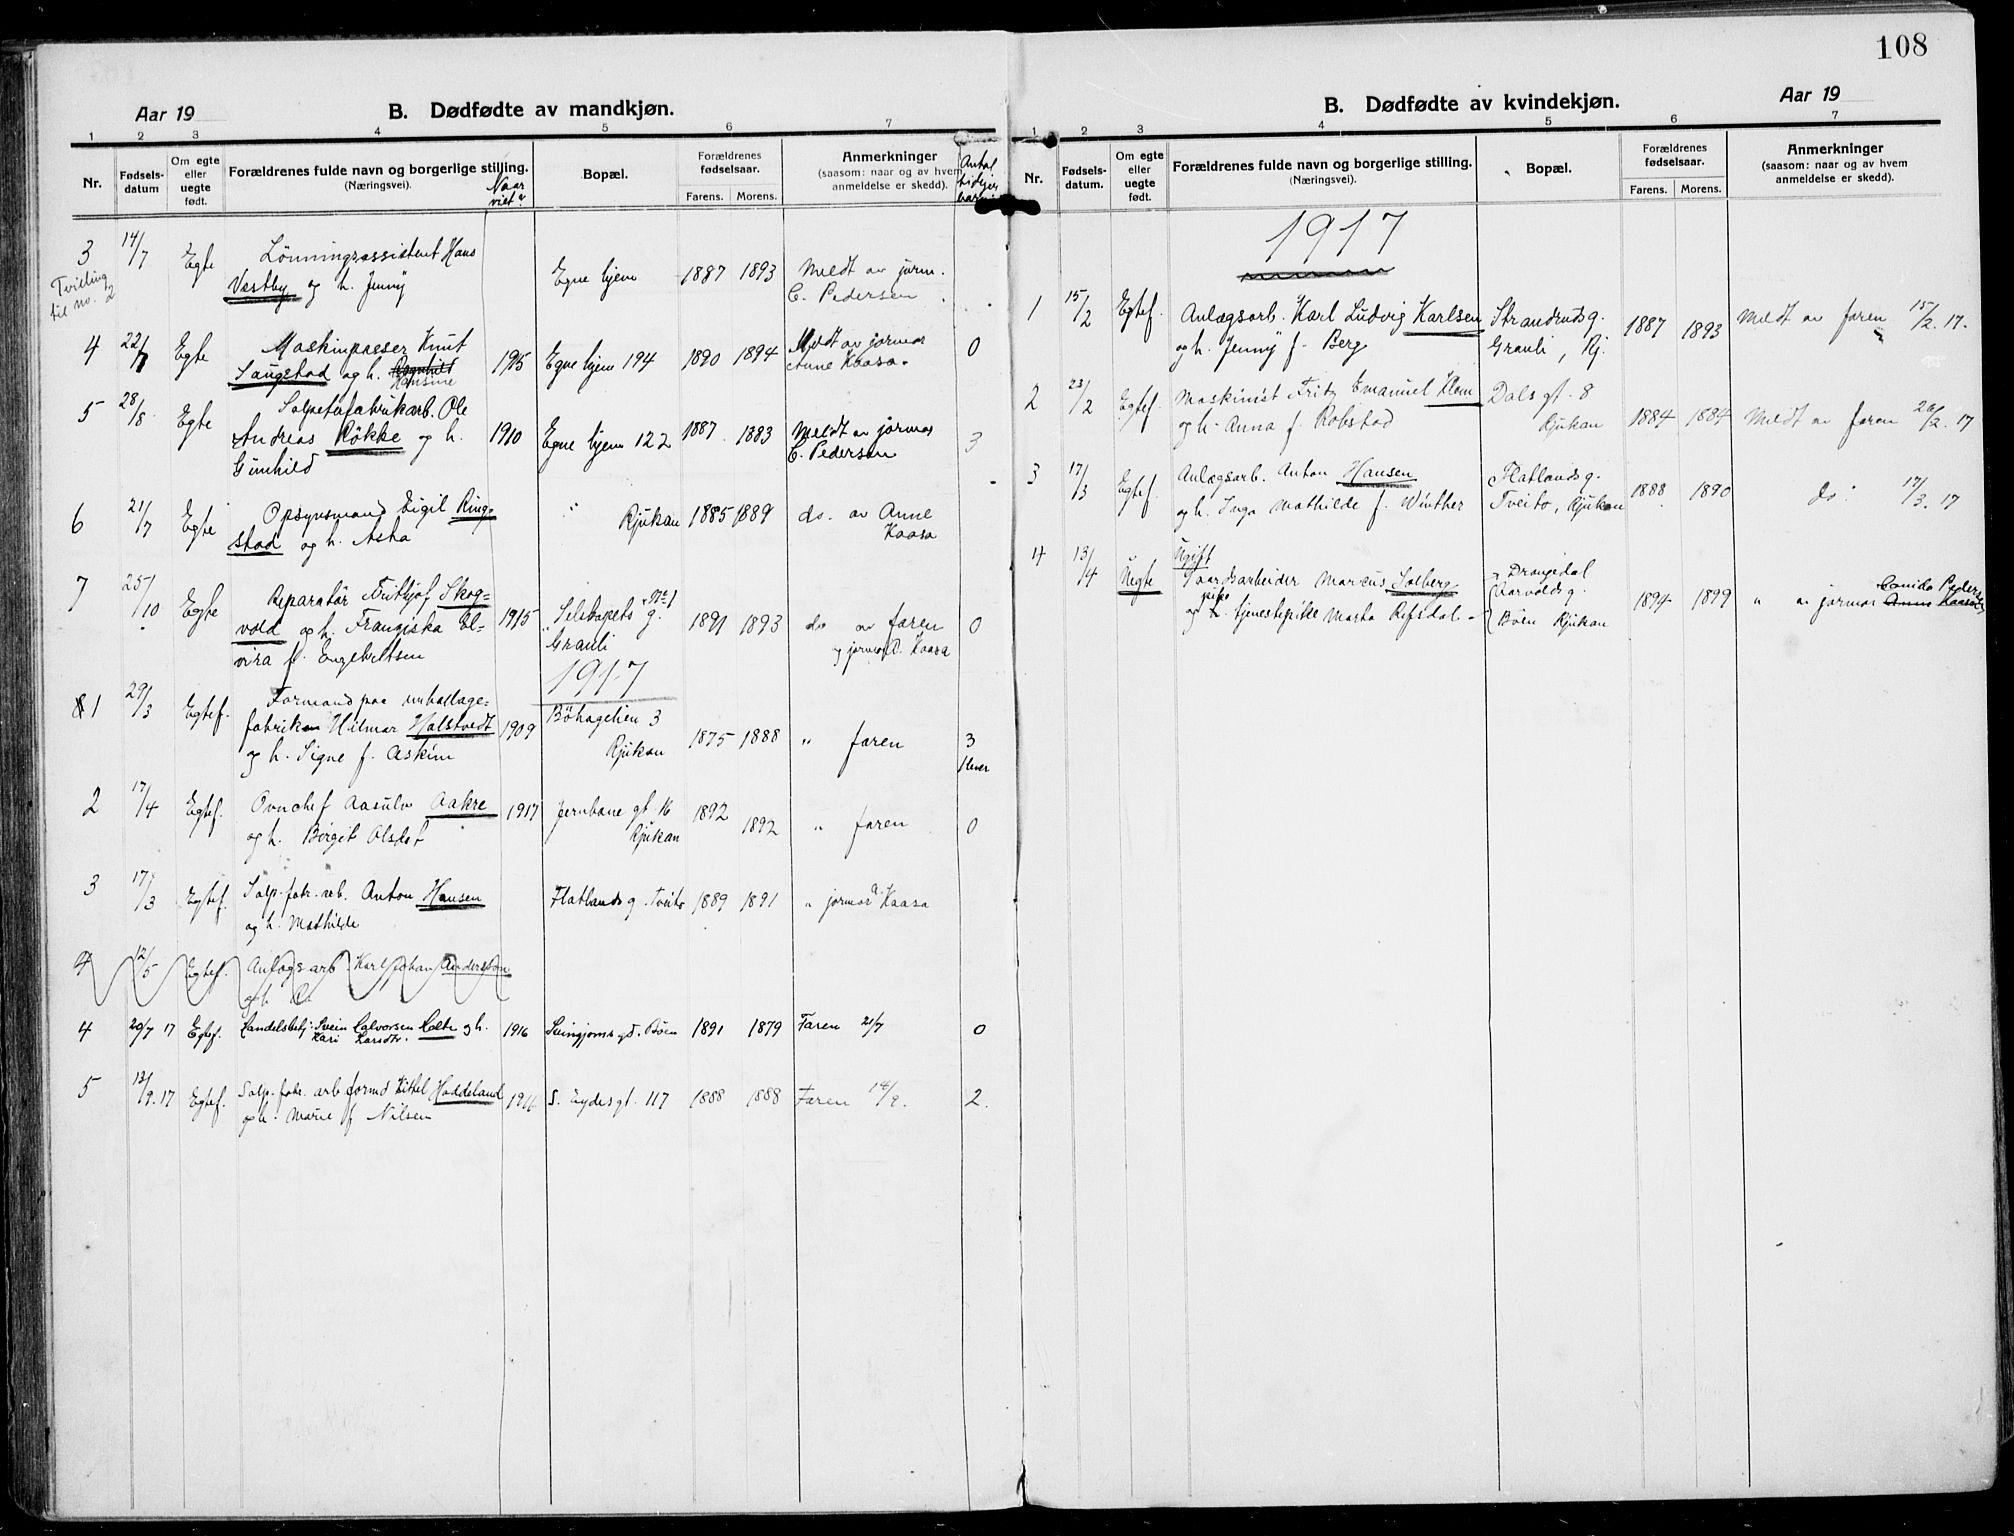 SAKO, Rjukan kirkebøker, F/Fa/L0002: Ministerialbok nr. 2, 1912-1917, s. 108